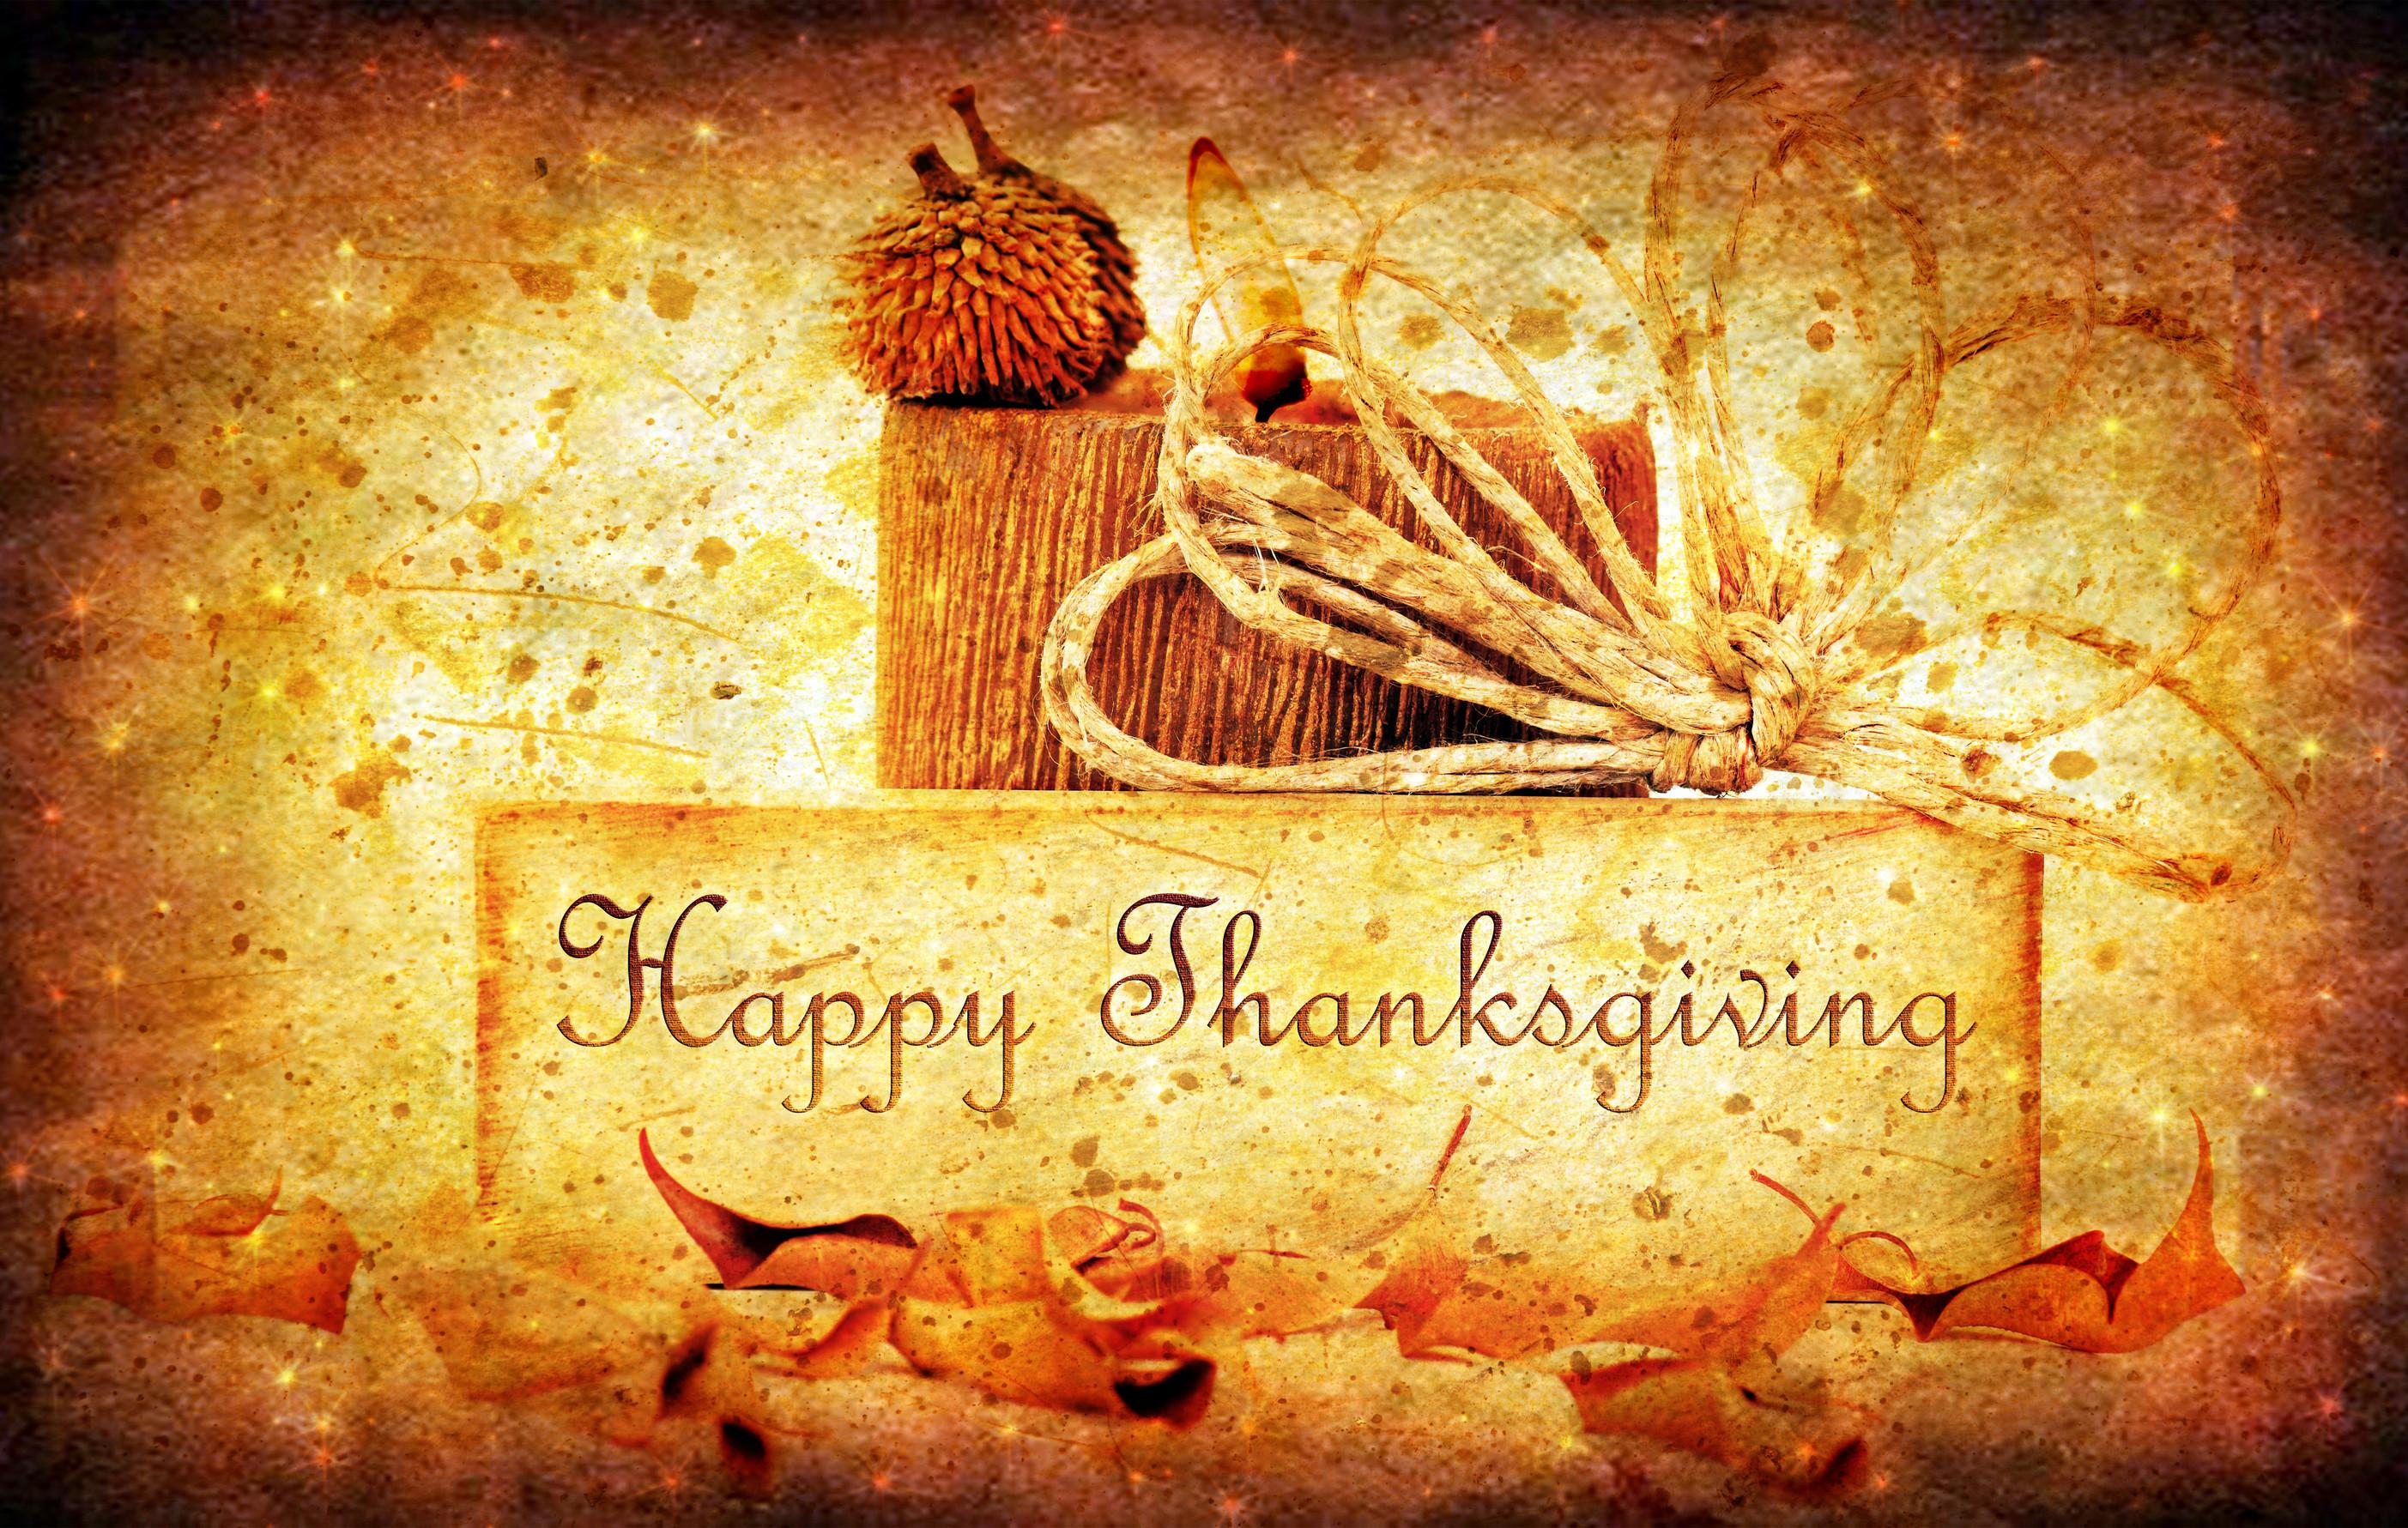 Res: 2806x1781, Thanksgiving Desktop Wallpapers HD.